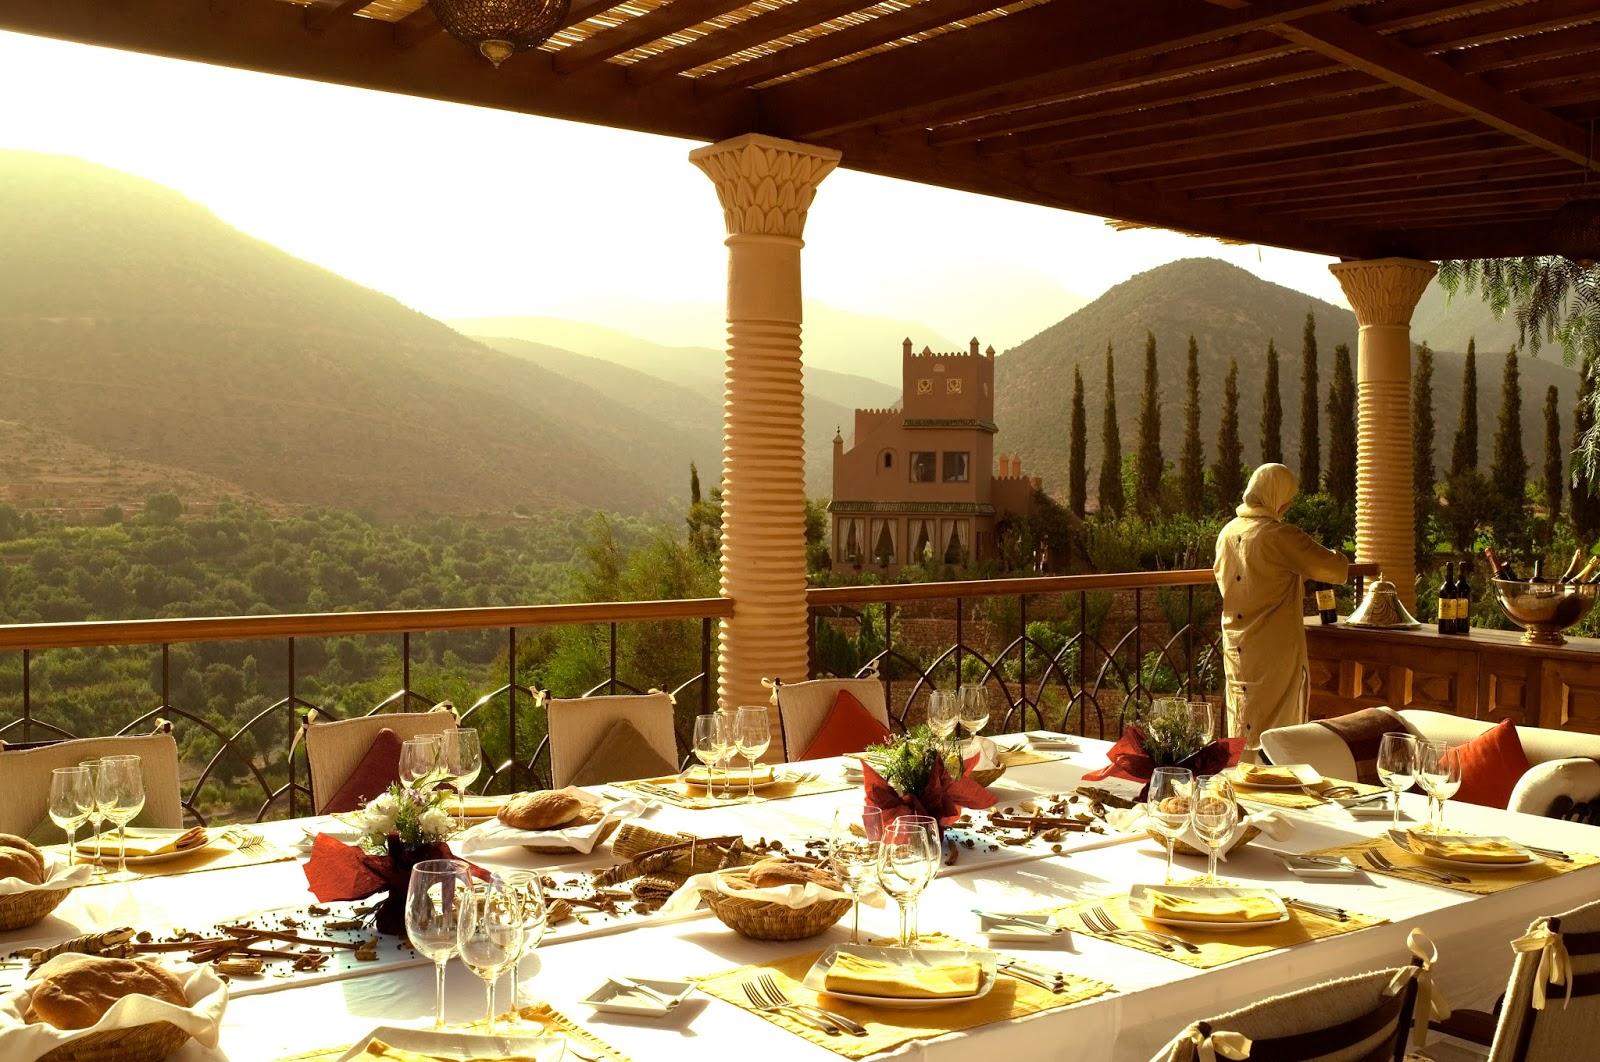 Urlaub in Marokko - Ritz Reisen